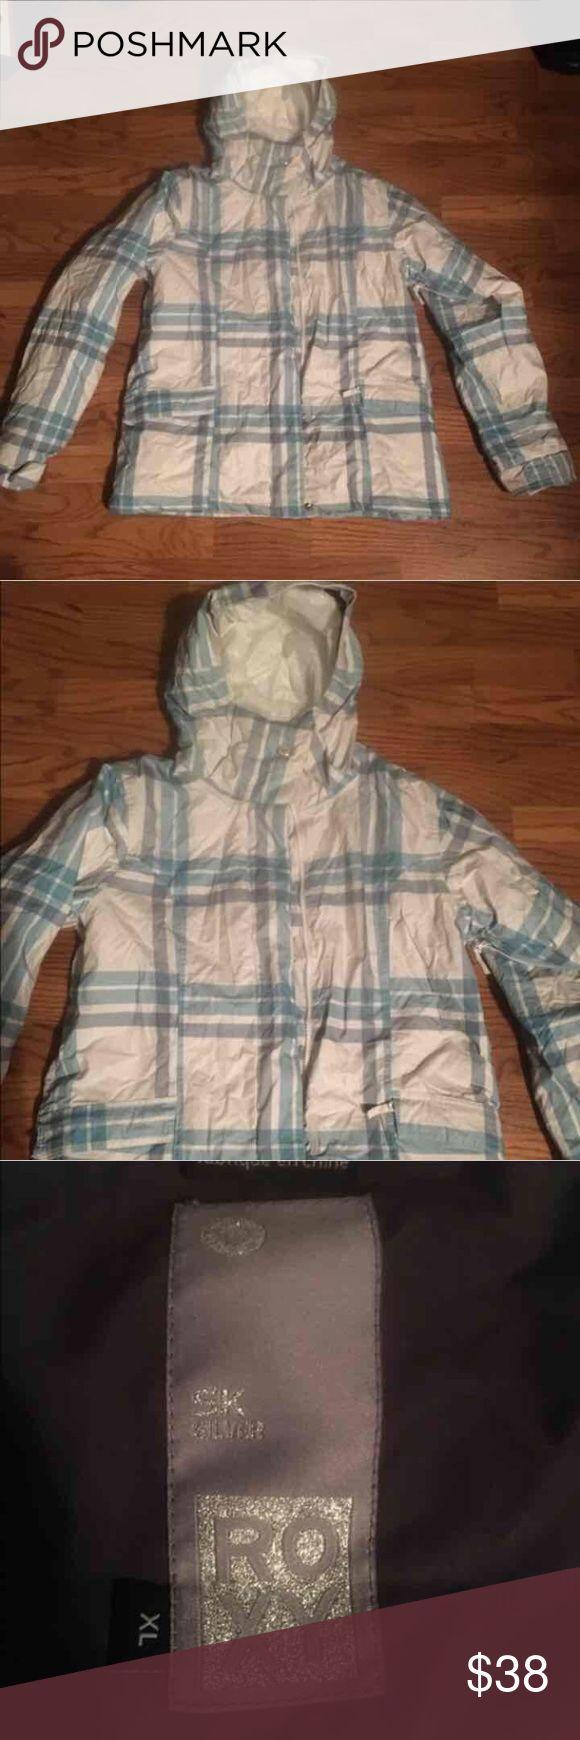 Plaid blue & white snowboarding jacket Roxy 5k silver jacket. Girls size xl or women's size medium Roxy Jackets & Coats